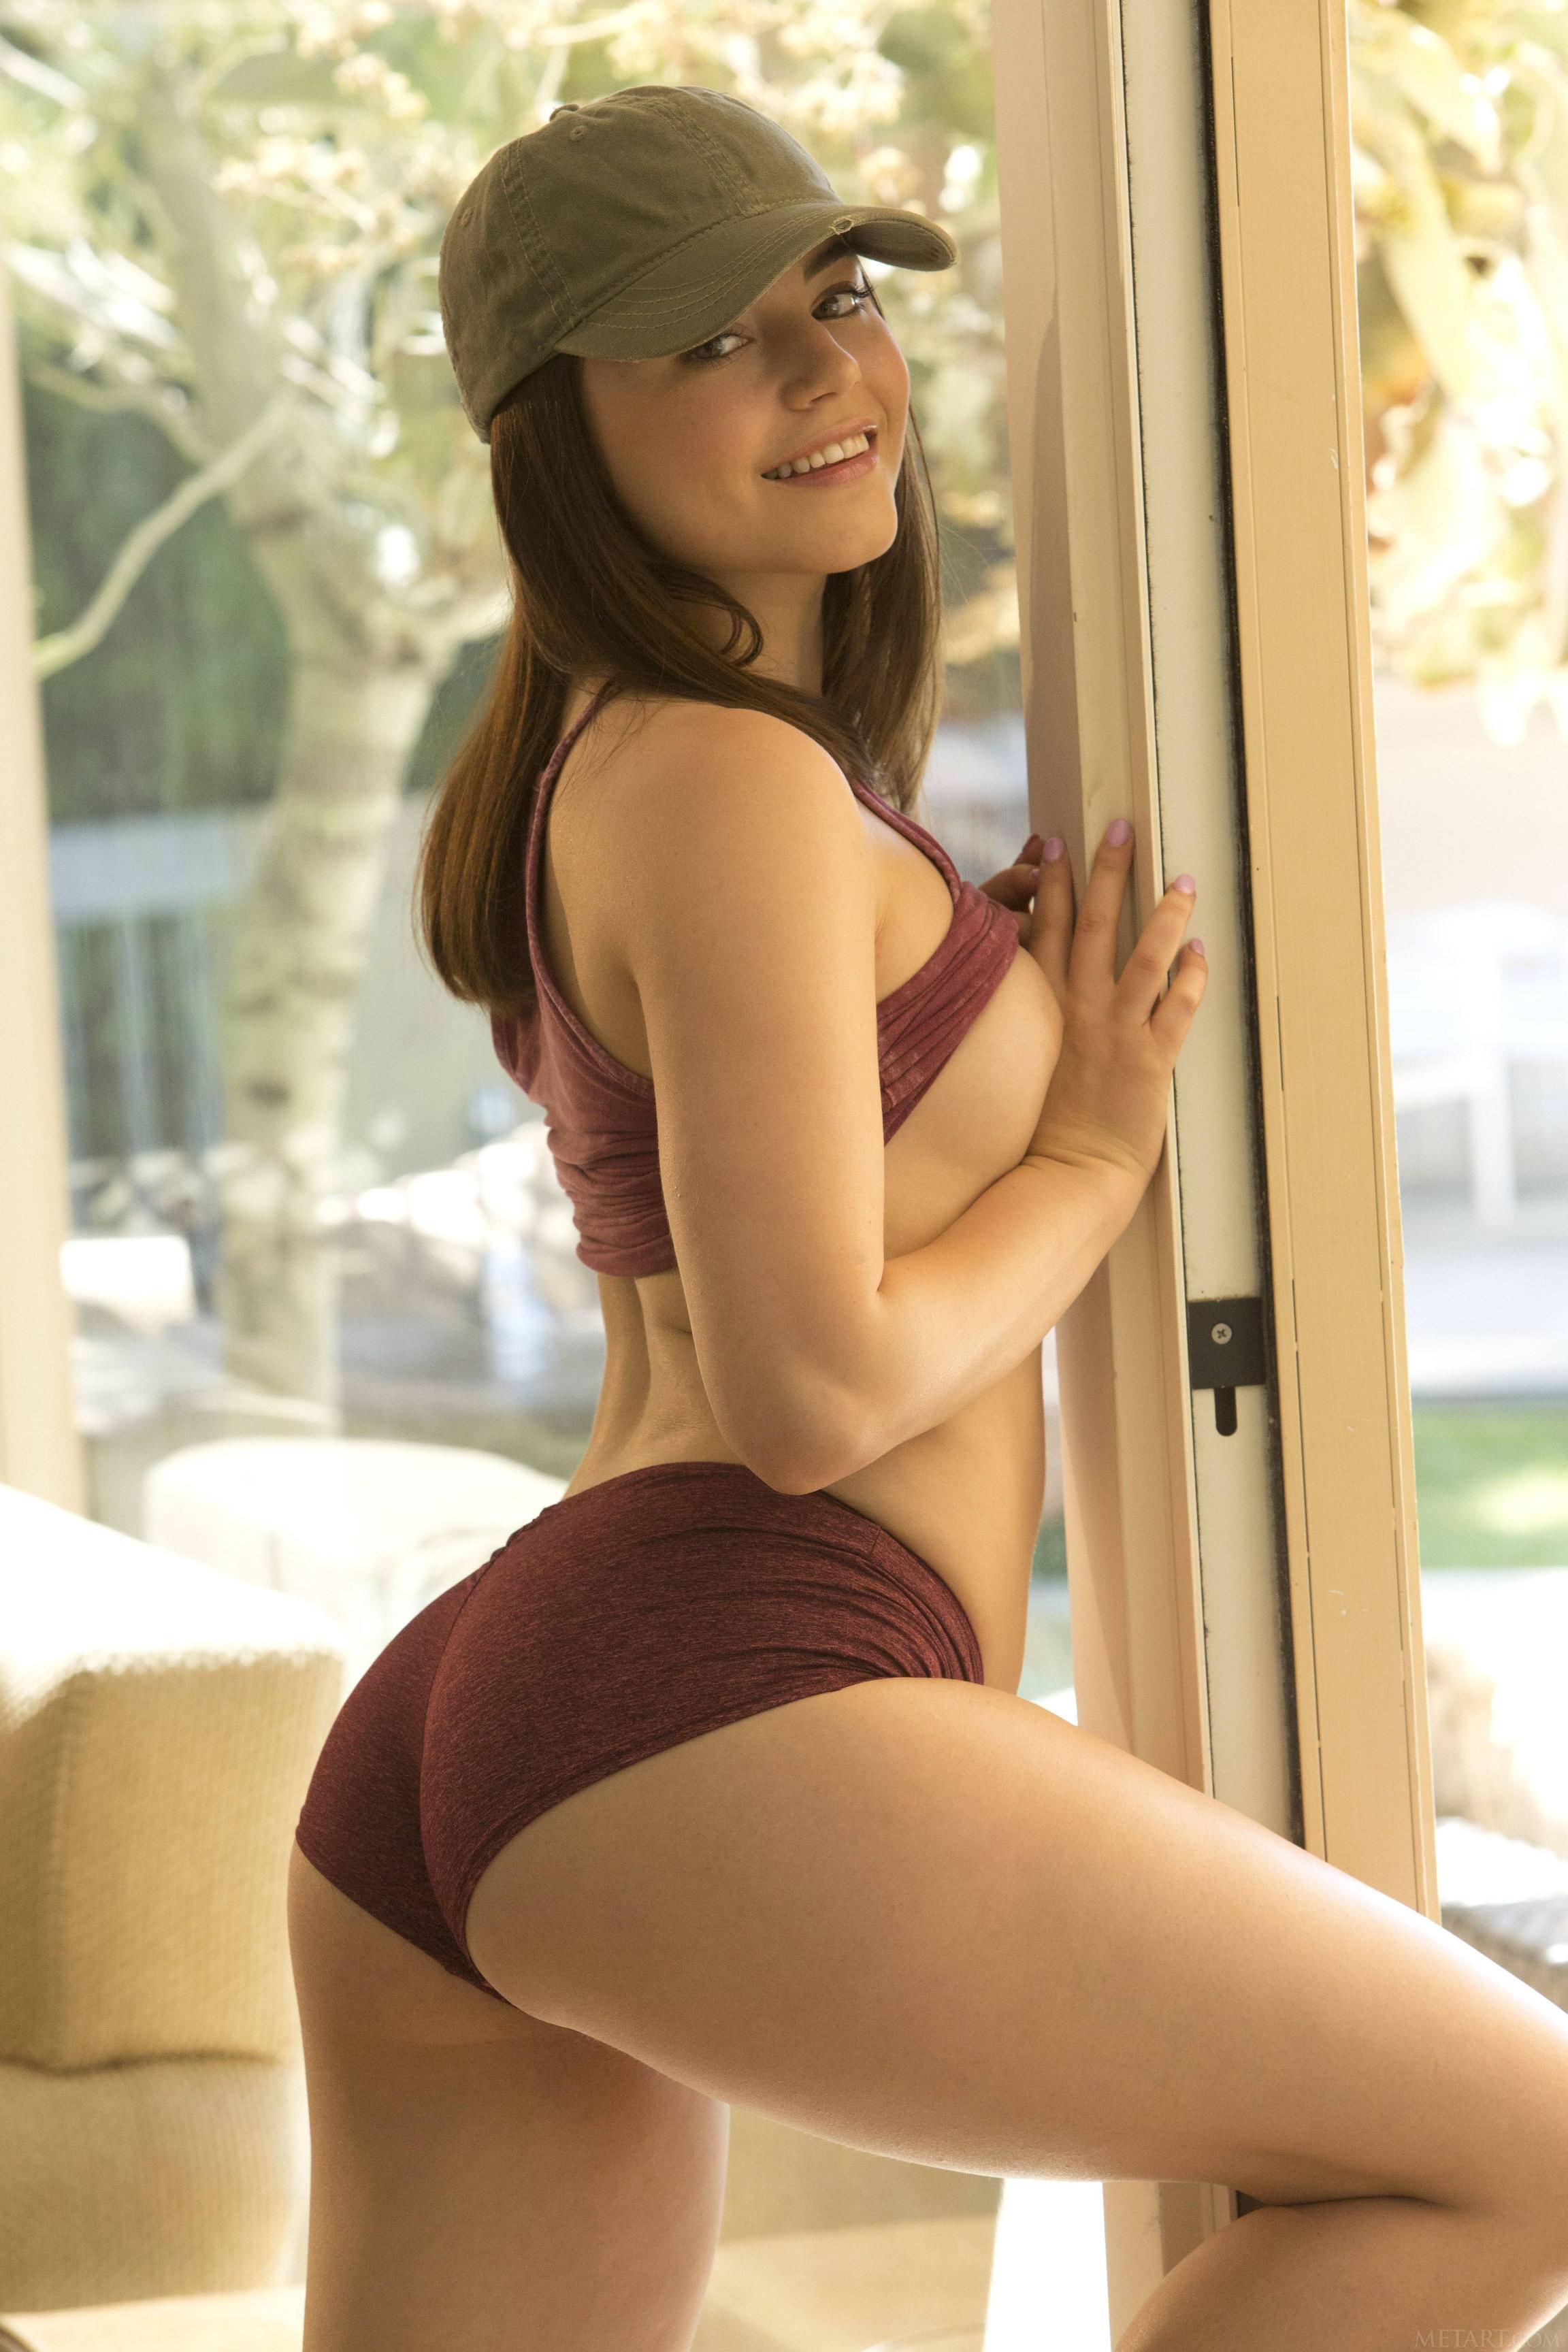 Slut wife porn theater